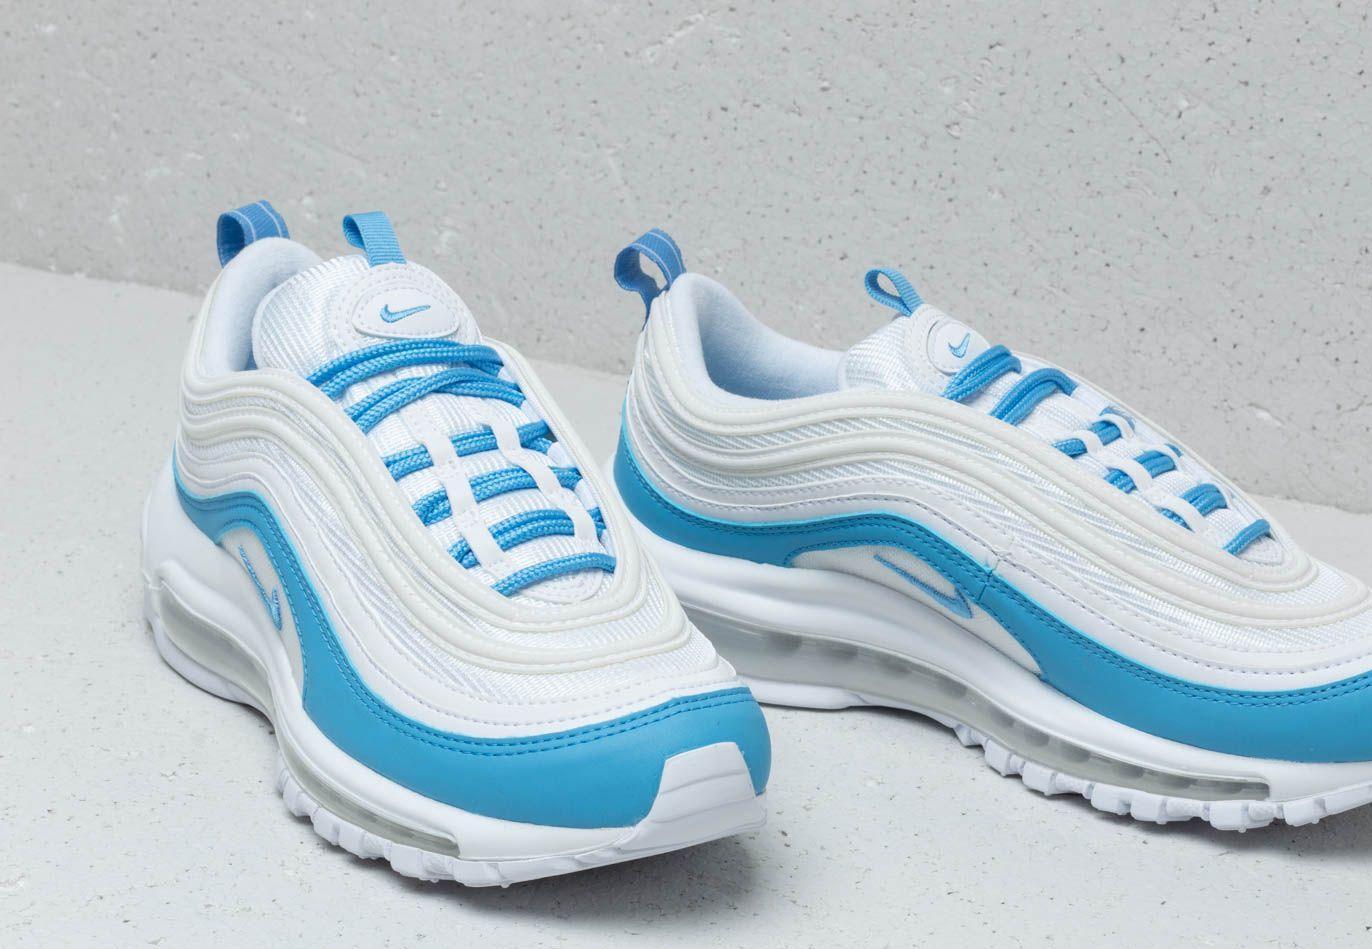 Nike Rubber W Air Max 97 Ess White/ University Blue - Lyst